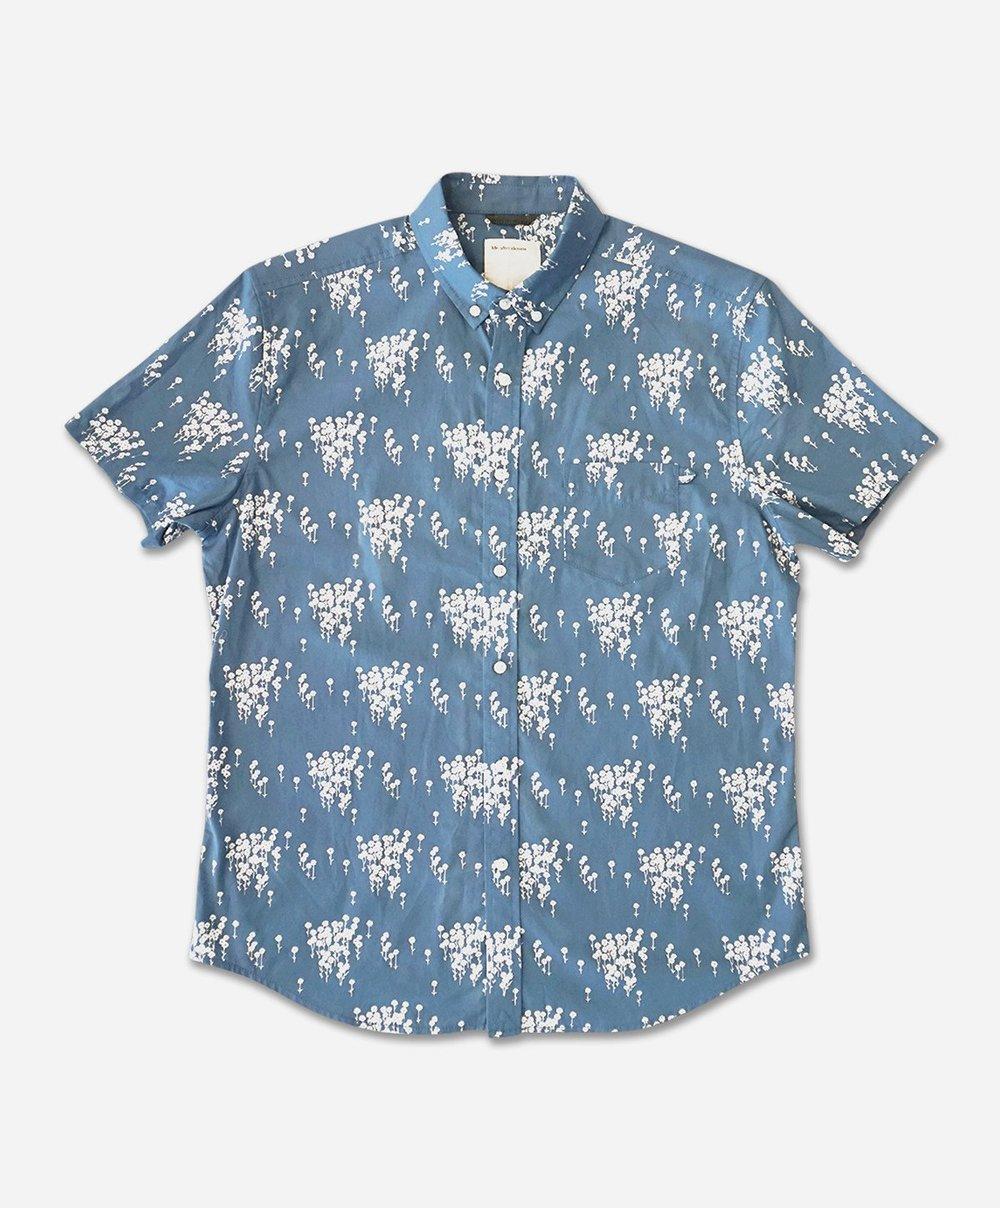 SS_Oxeye_Shirt-Lt-Blue_2048x2048.jpg